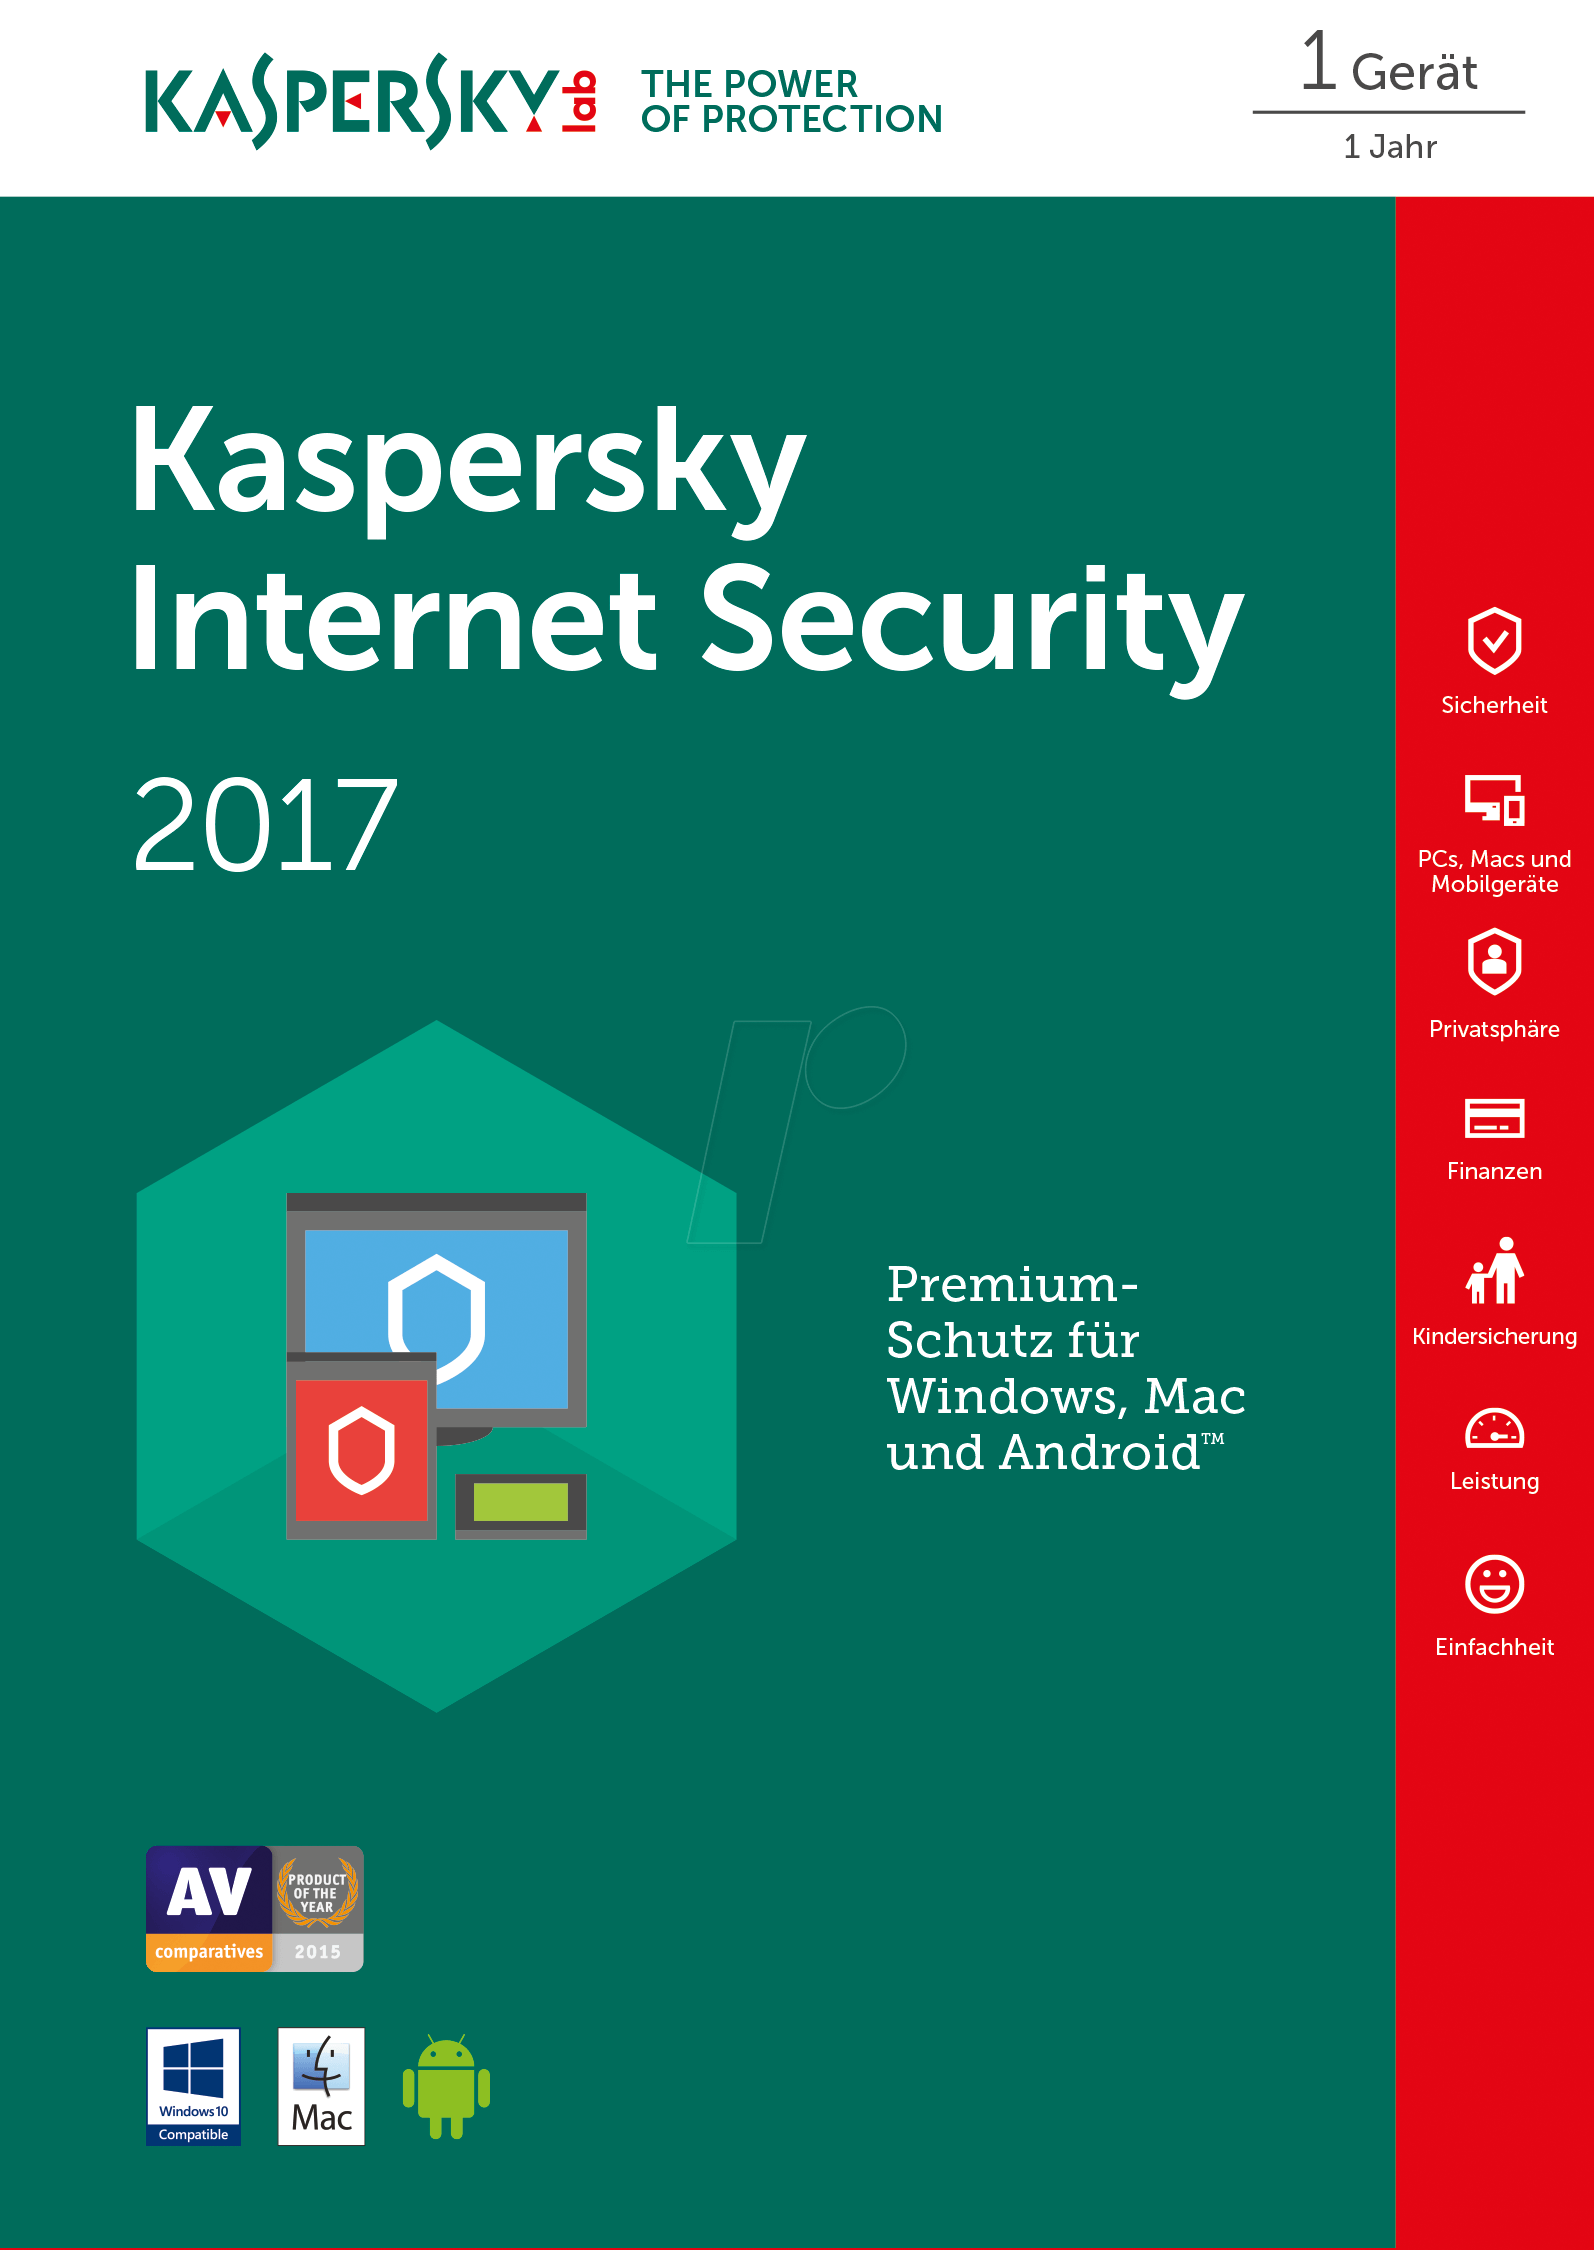 https://cdn-reichelt.de/bilder/web/xxl_ws/G500/KASPERSKY_IS2017_02.png